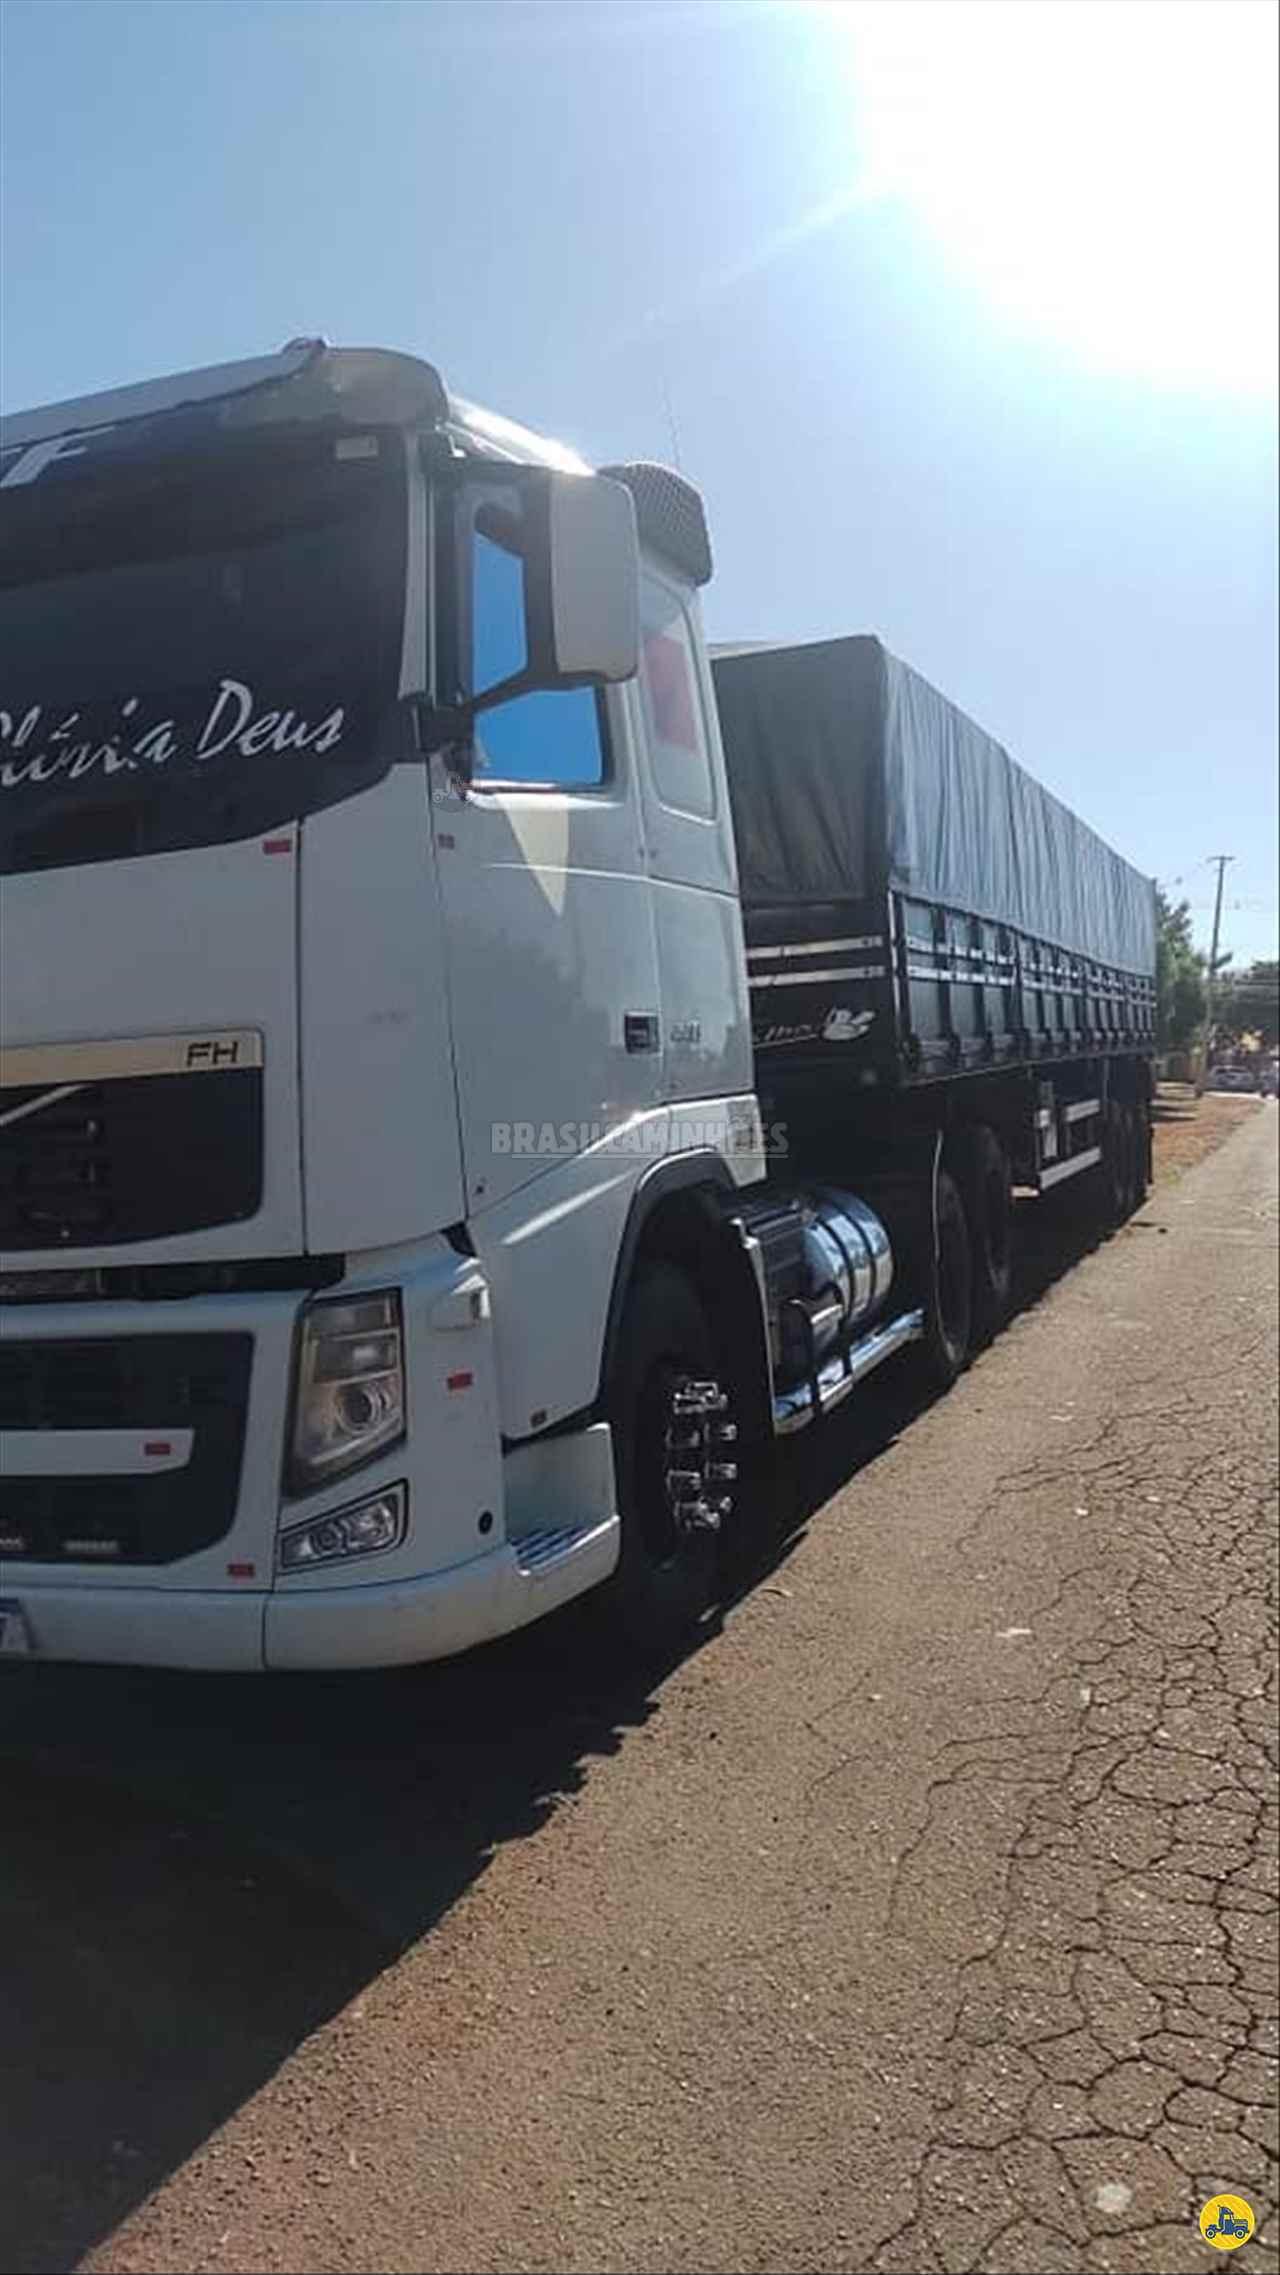 CAMINHAO VOLVO VOLVO FH 440 Carga Seca Truck 6x2 Brasil Caminhões Sinop SINOP MATO GROSSO MT